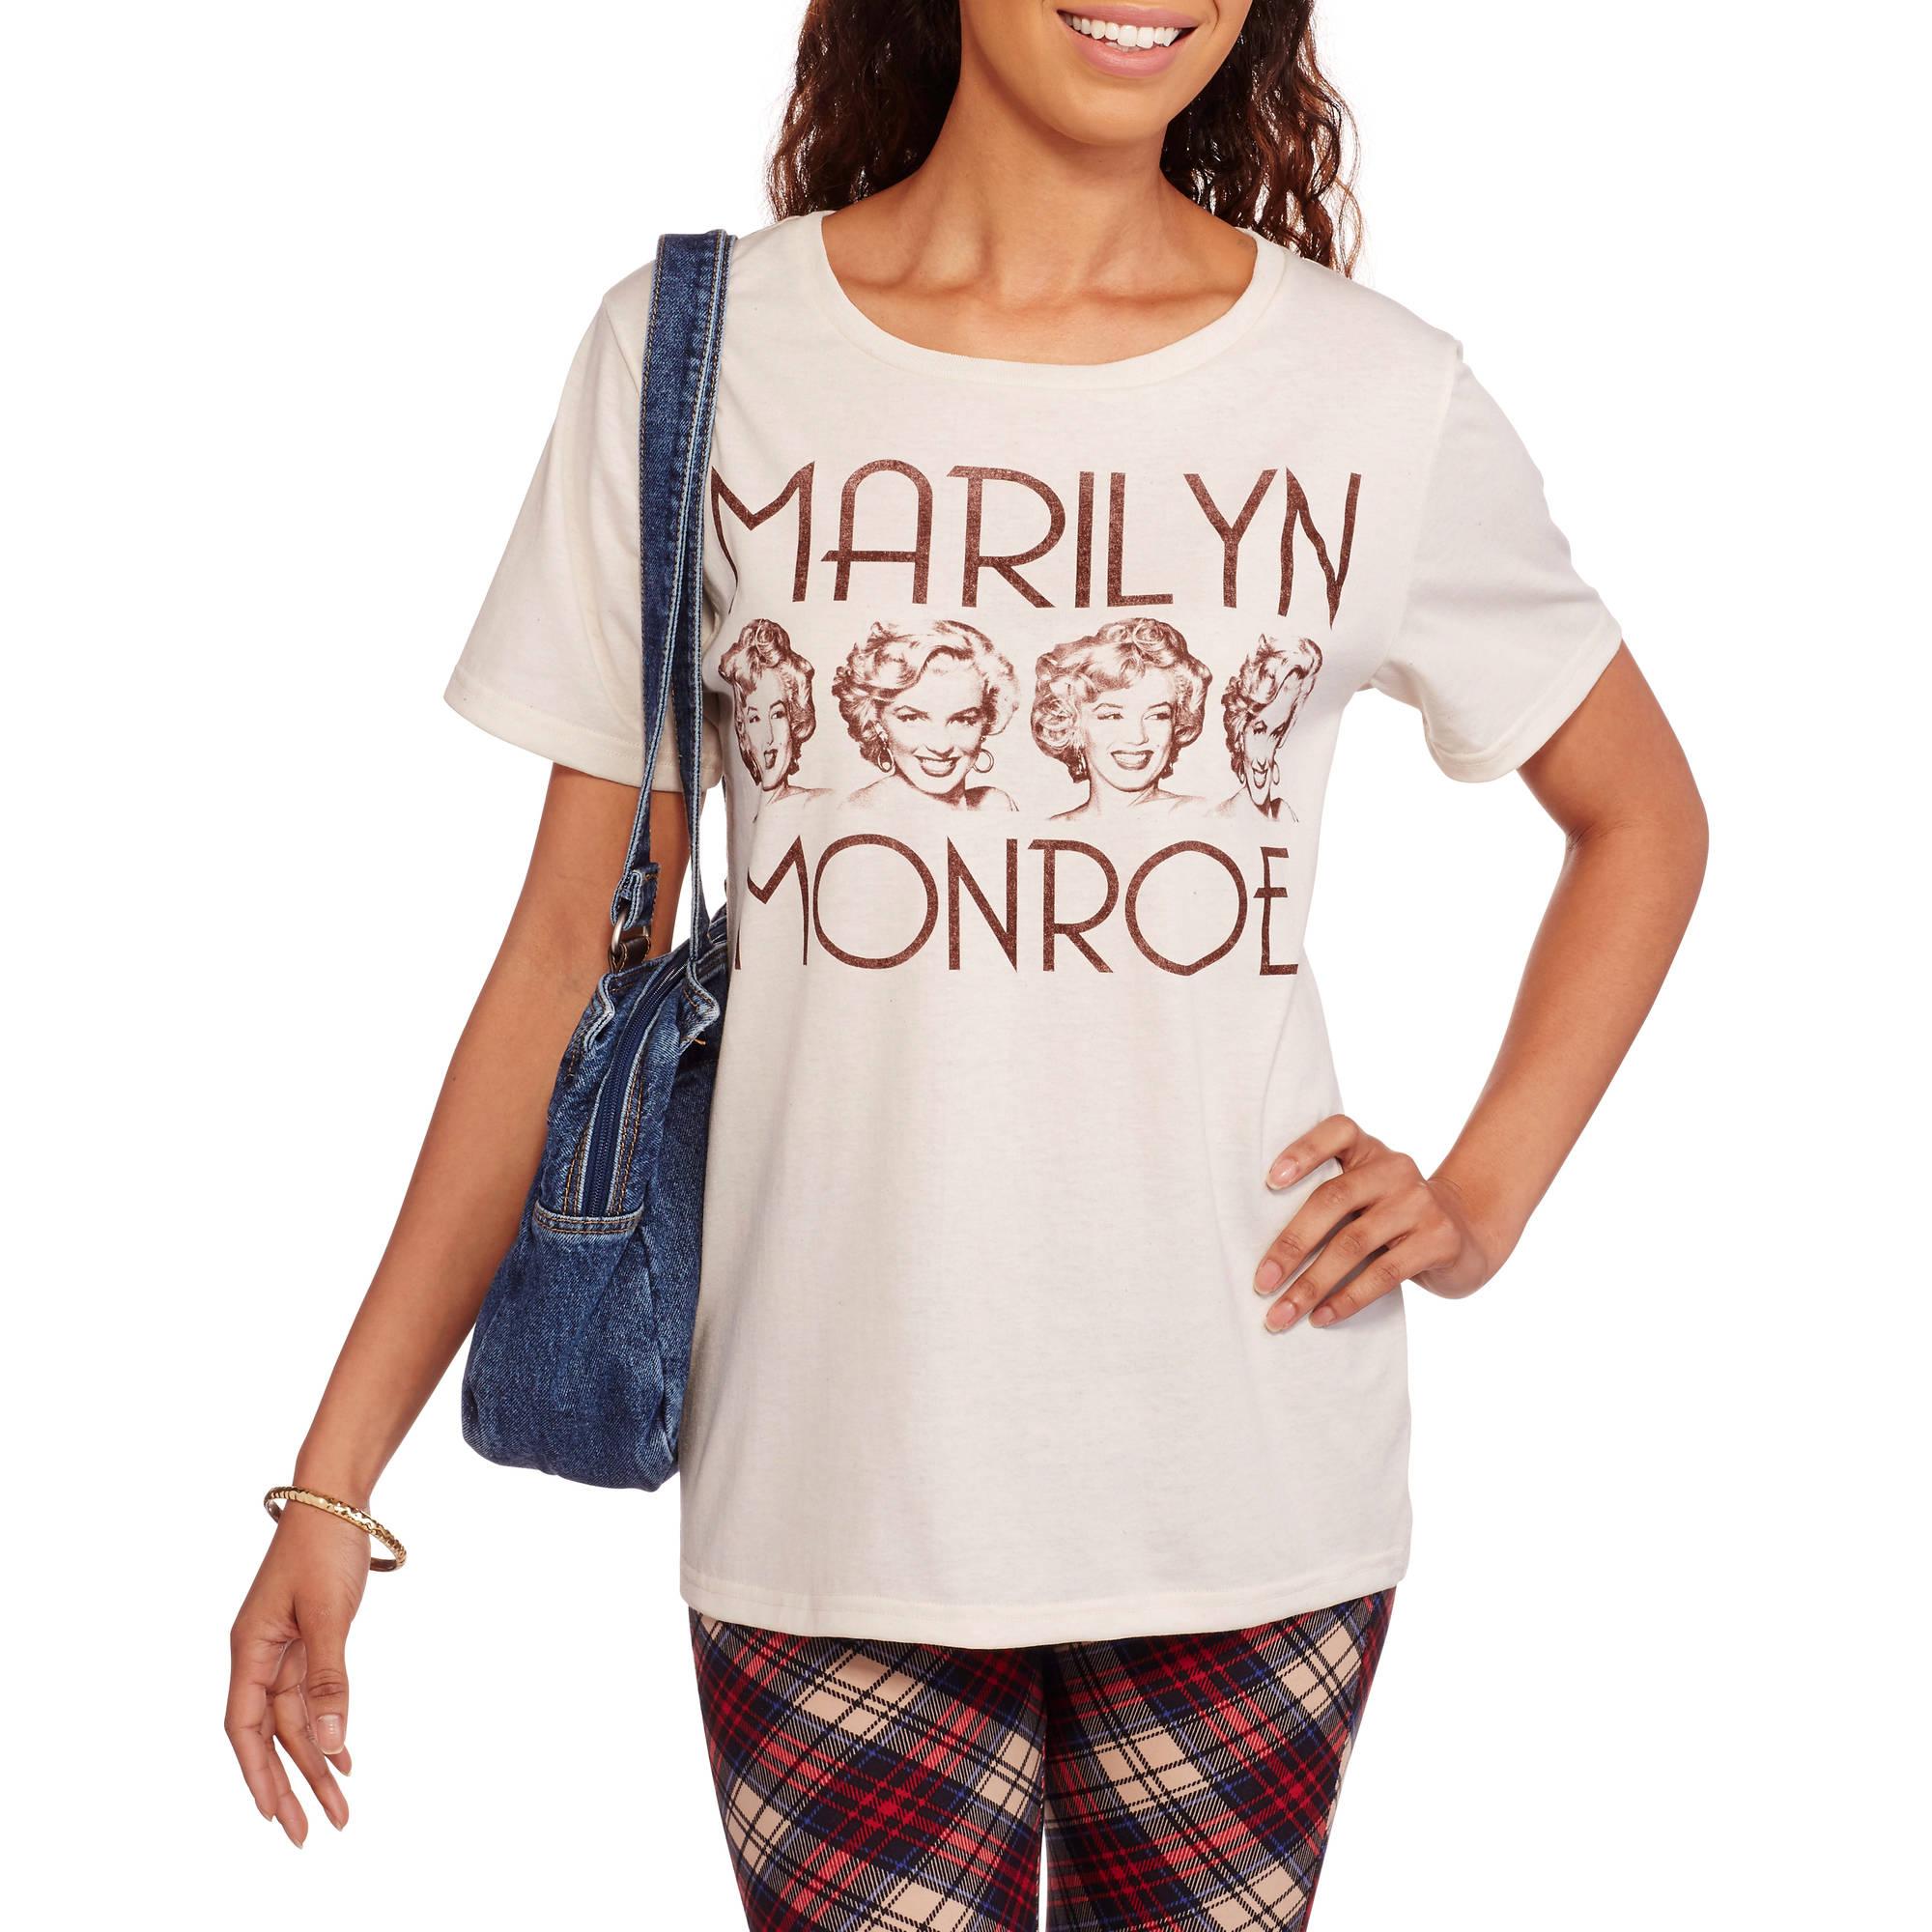 Marilyn Monroe Juniors' Graphic T-Shirt